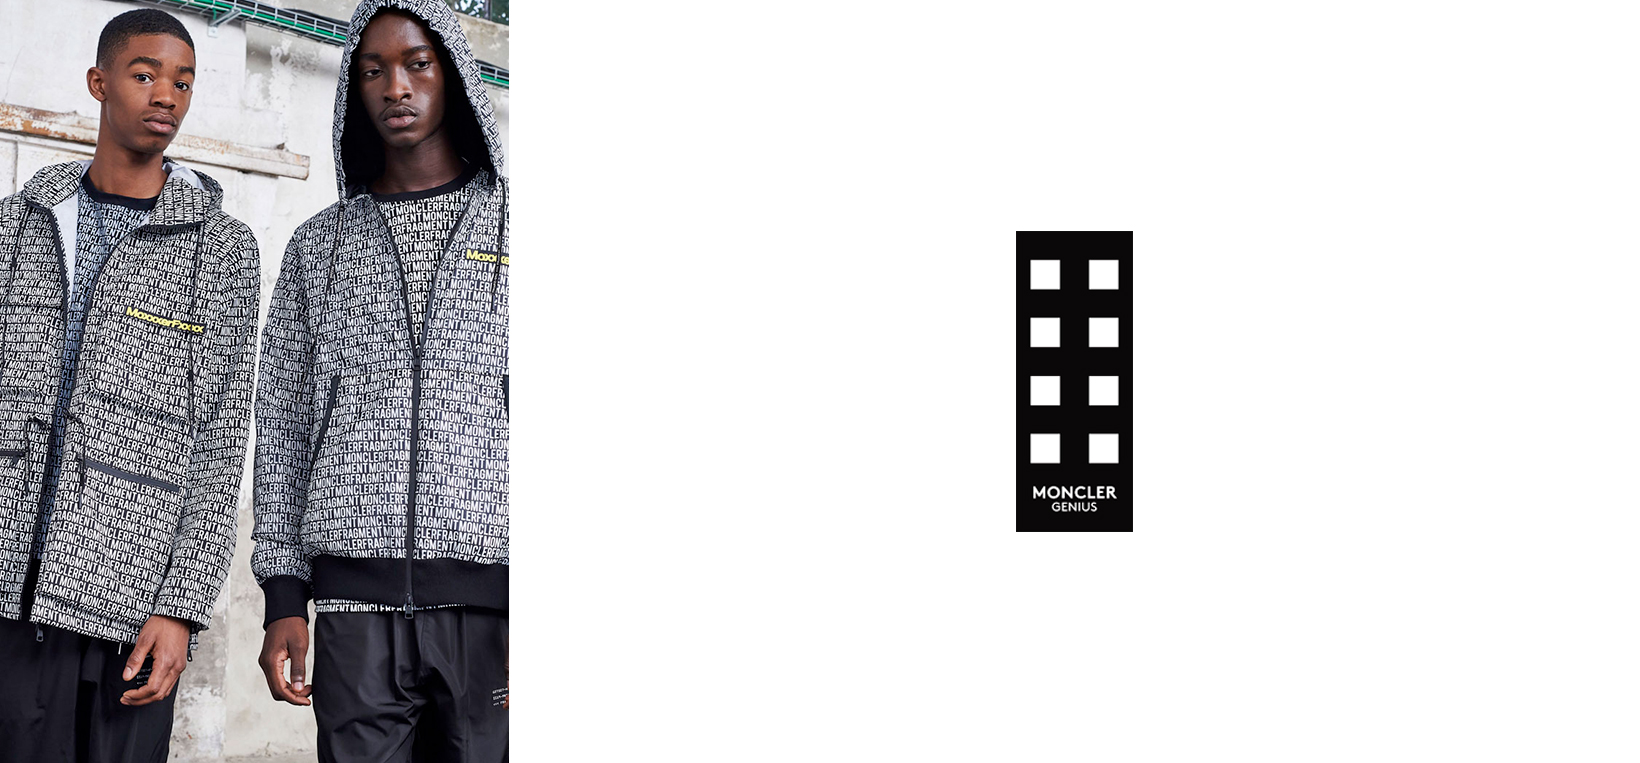 MONCLER CRAIG GREEN - Uomo - Abbigliamento - GILET - Leam Roma